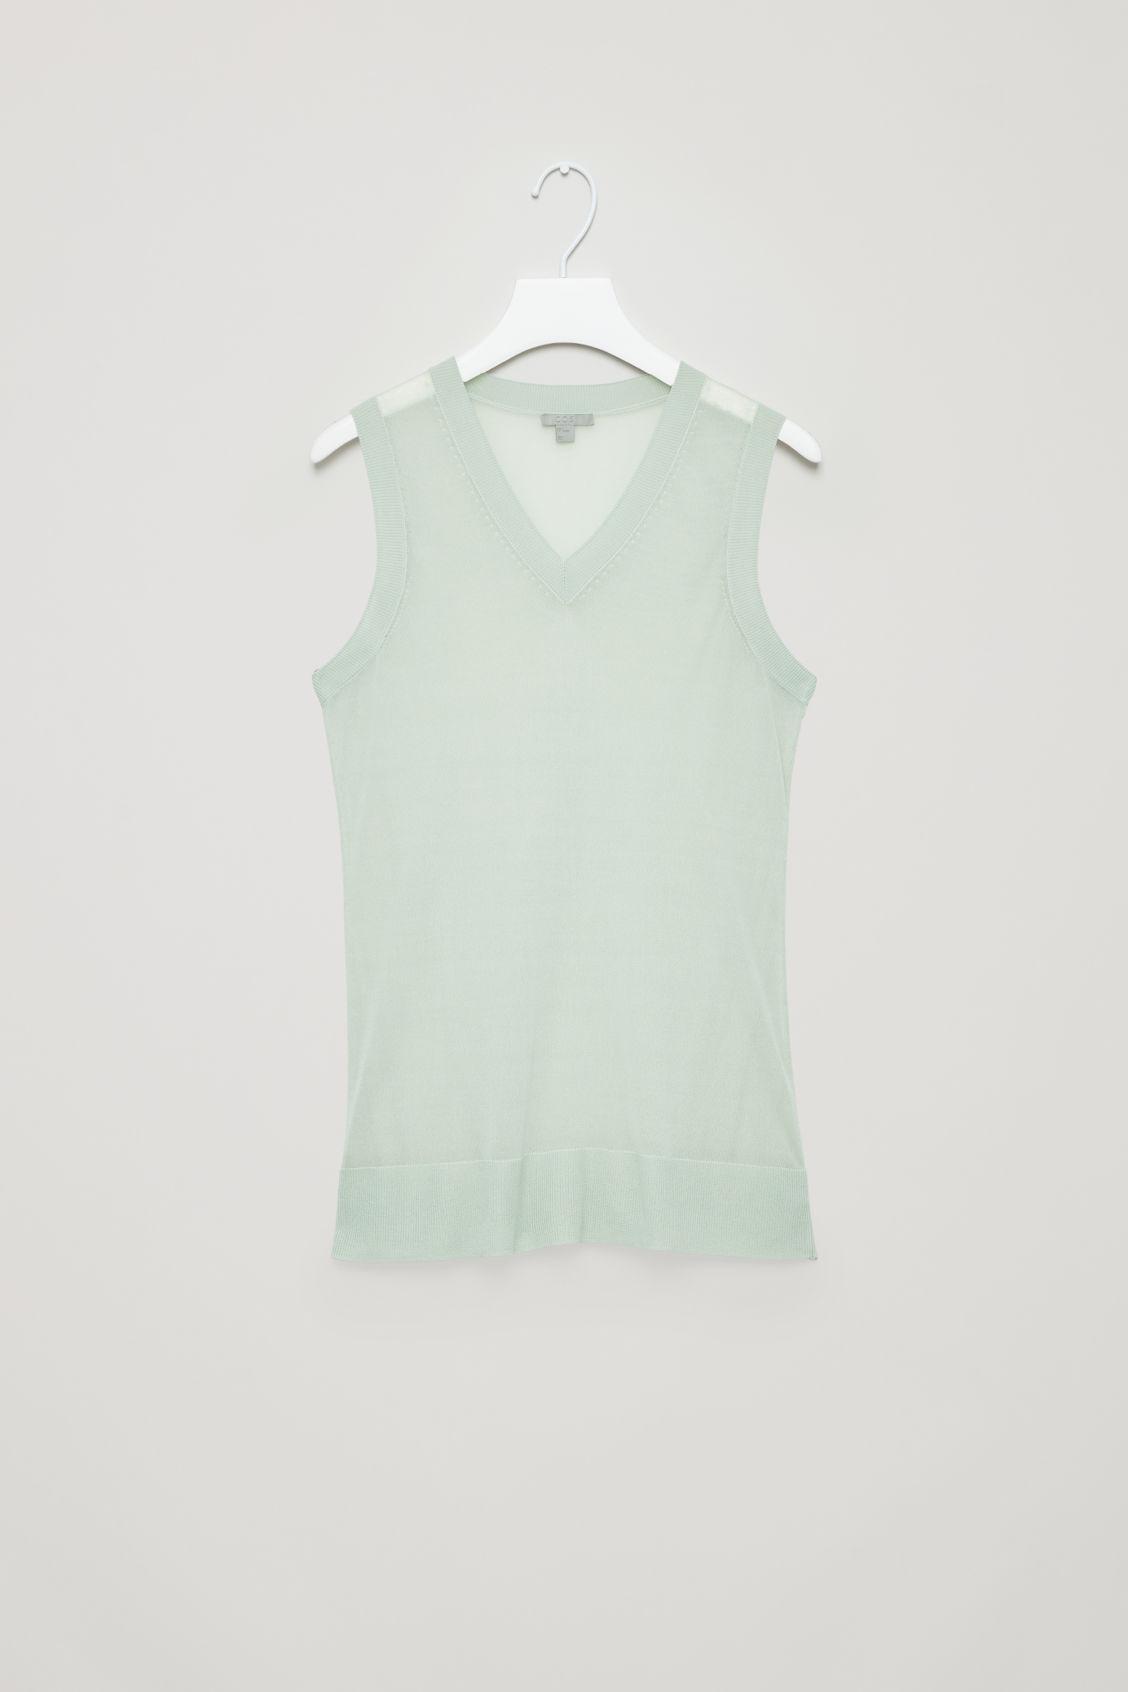 Cos Sleeveless Sheer Vest In Green